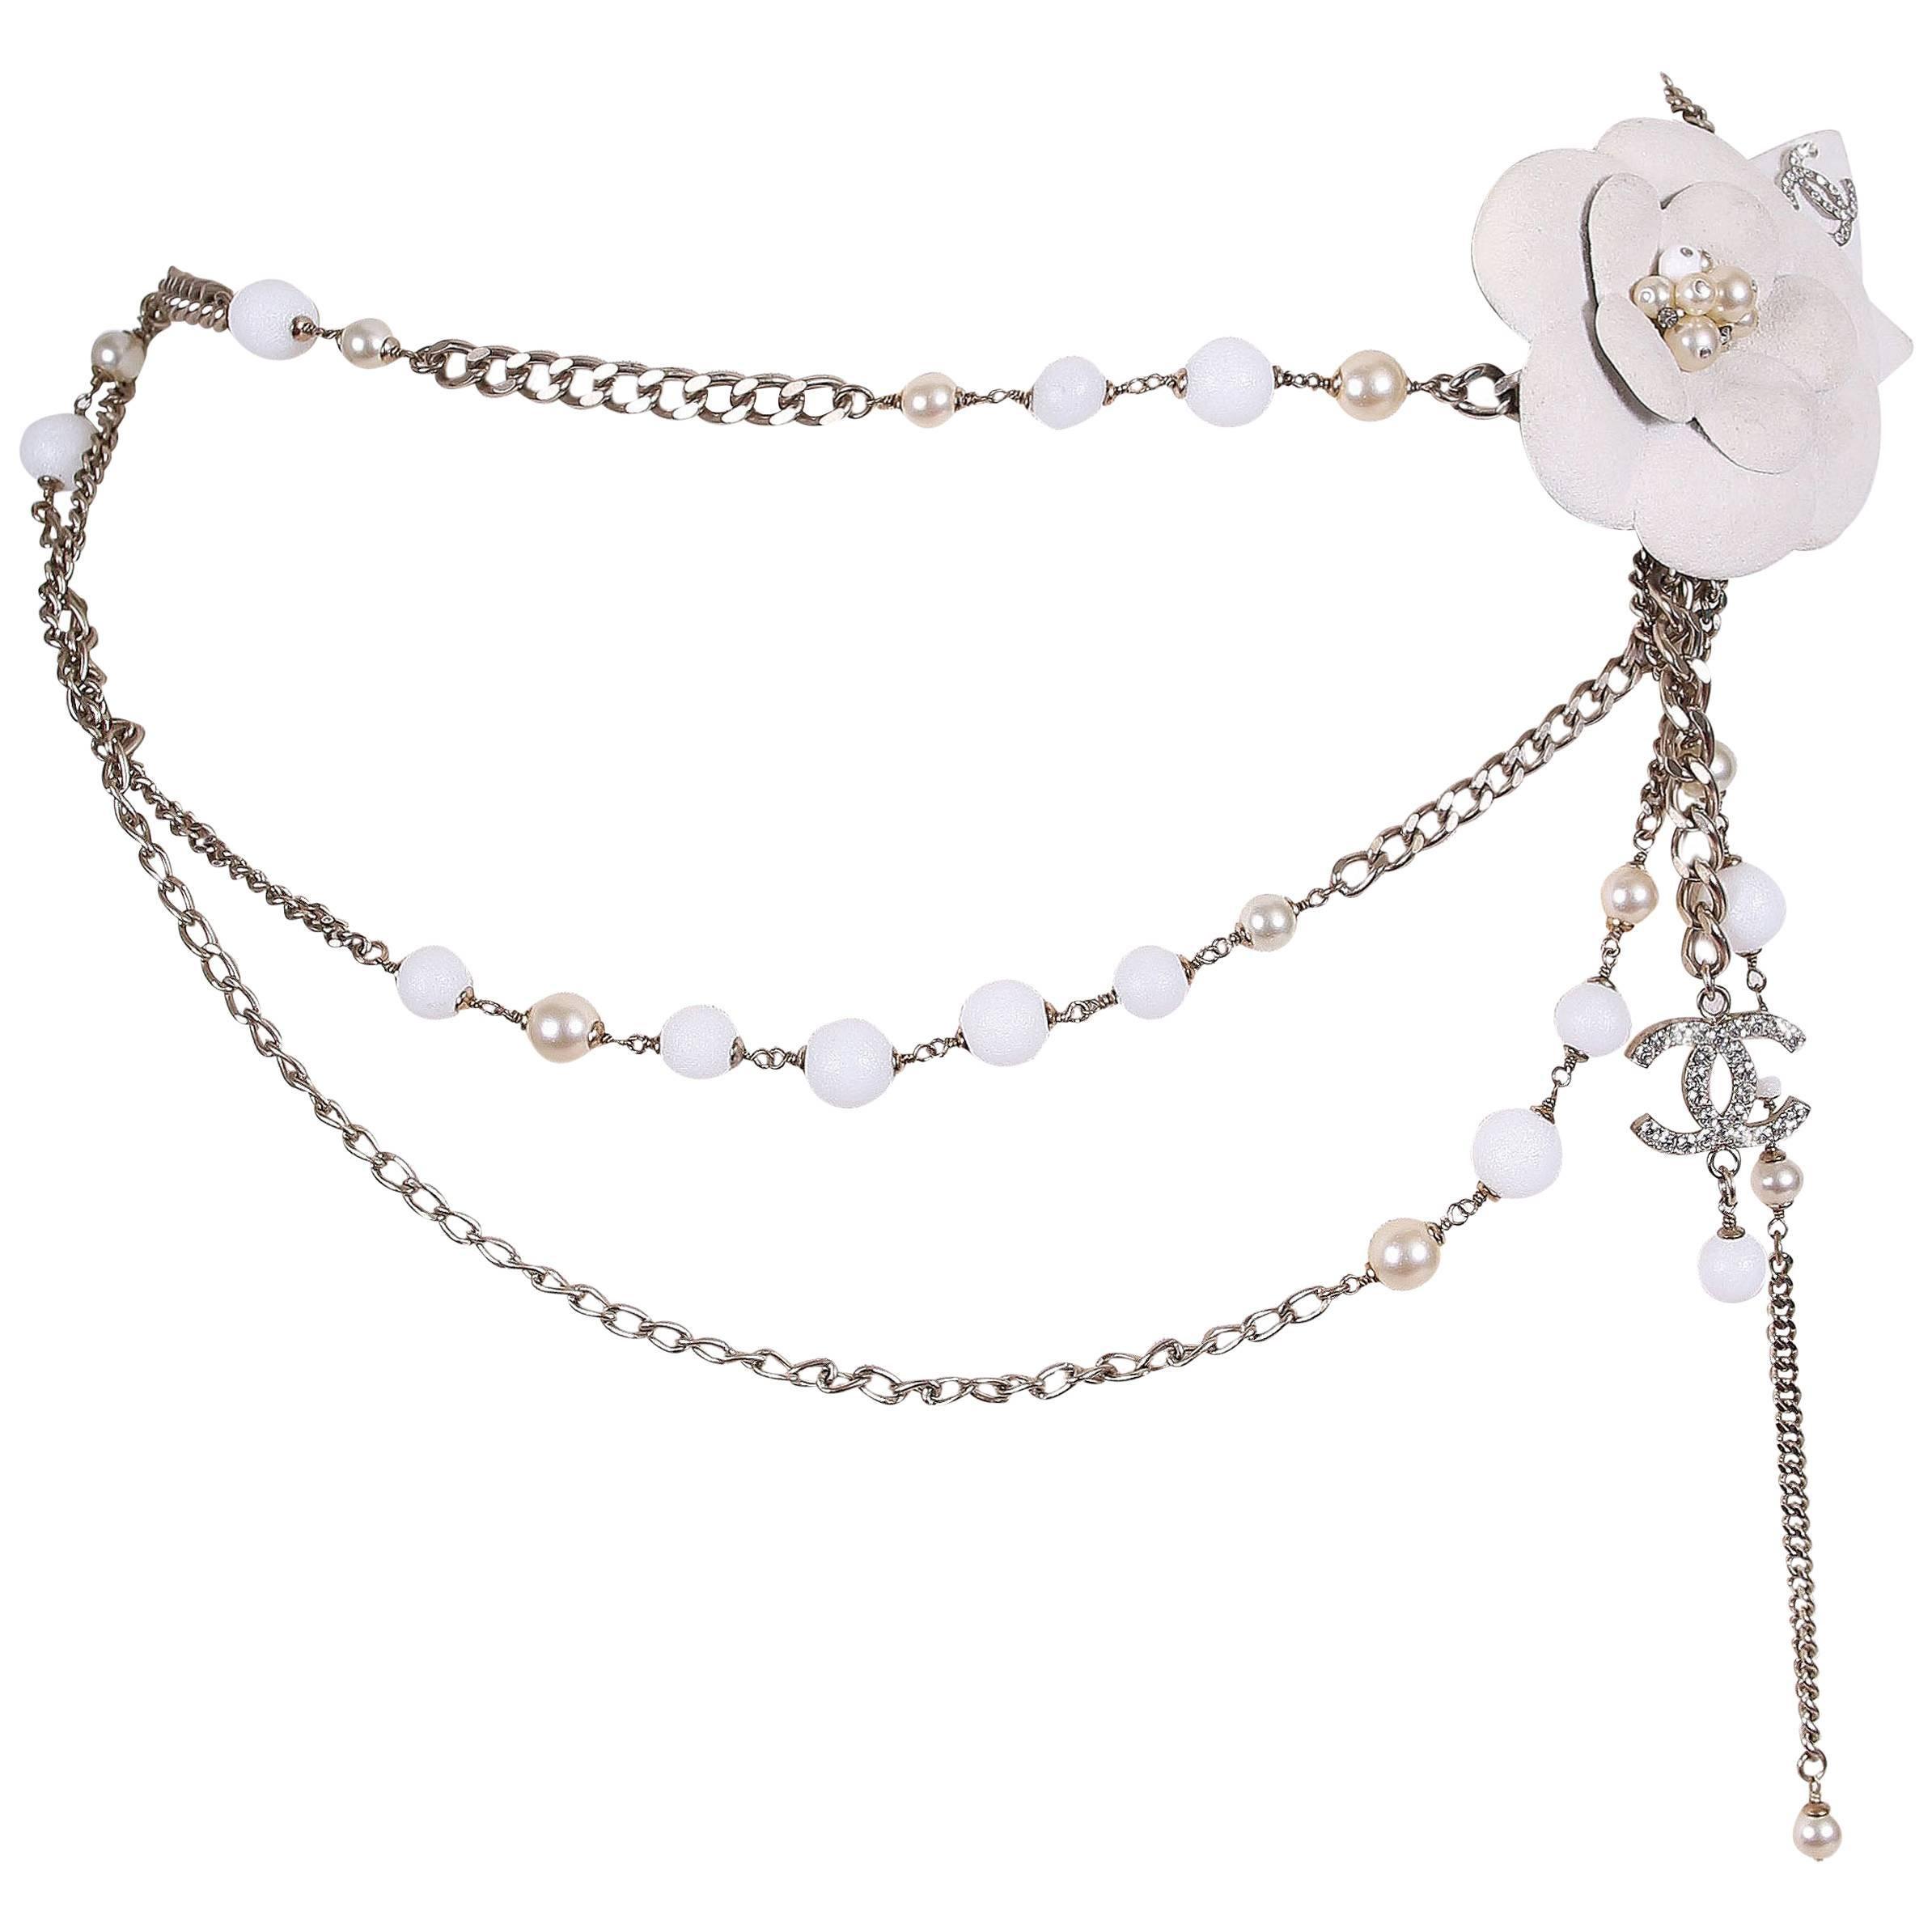 Chanel 2005 Chanel Silver Tone Chain & Bead Belt W/metal Camellia W/pearls ztufOZYxY